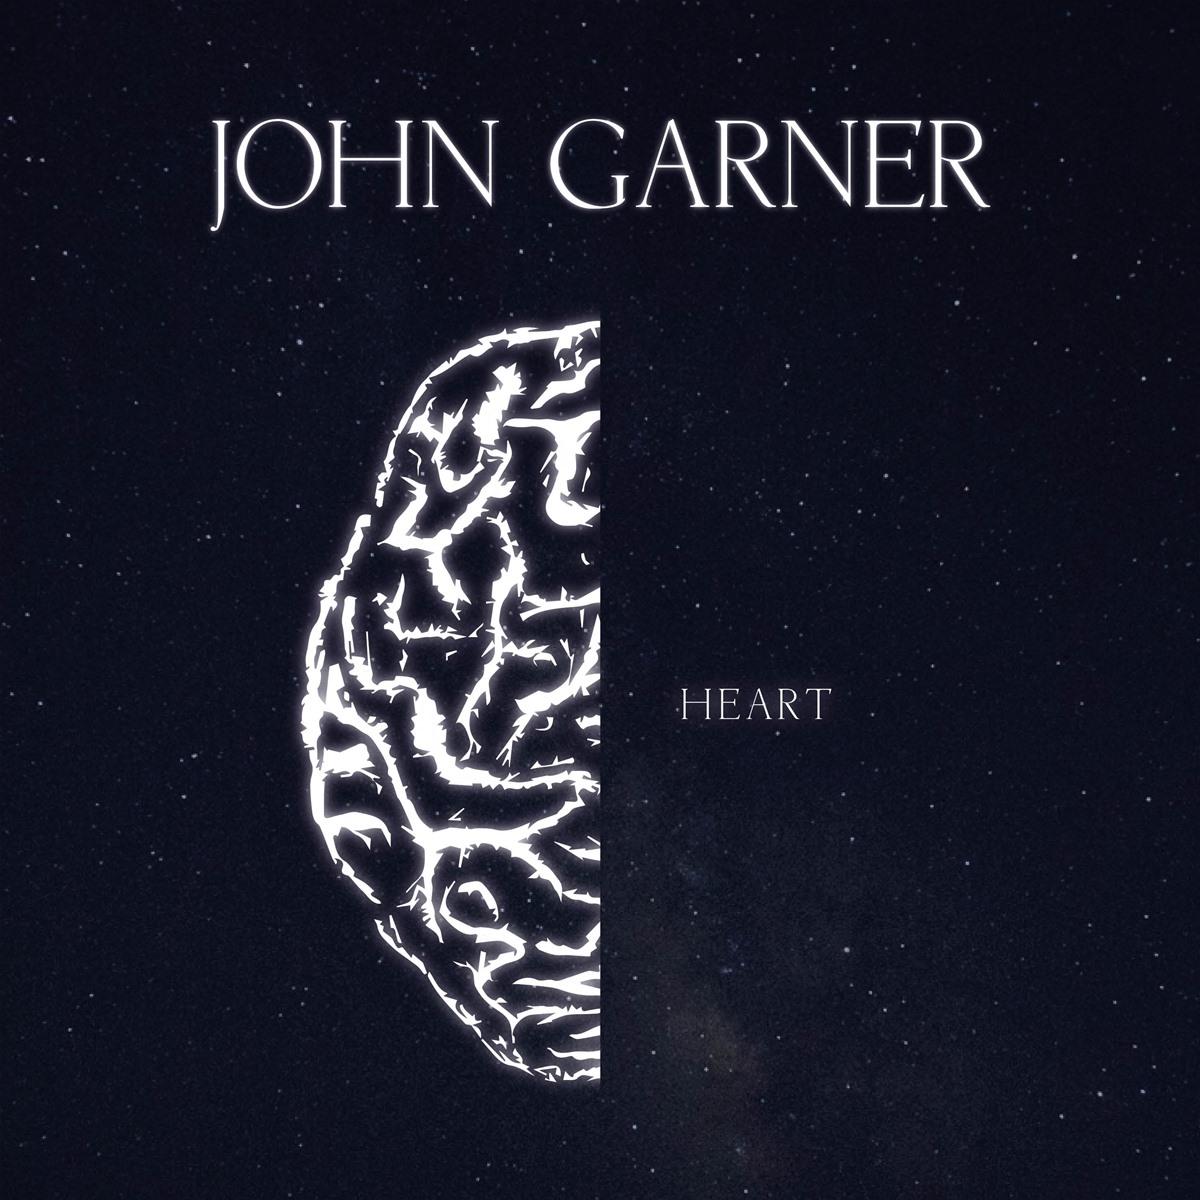 JOHNGARNER, Heart, Ep, Cover